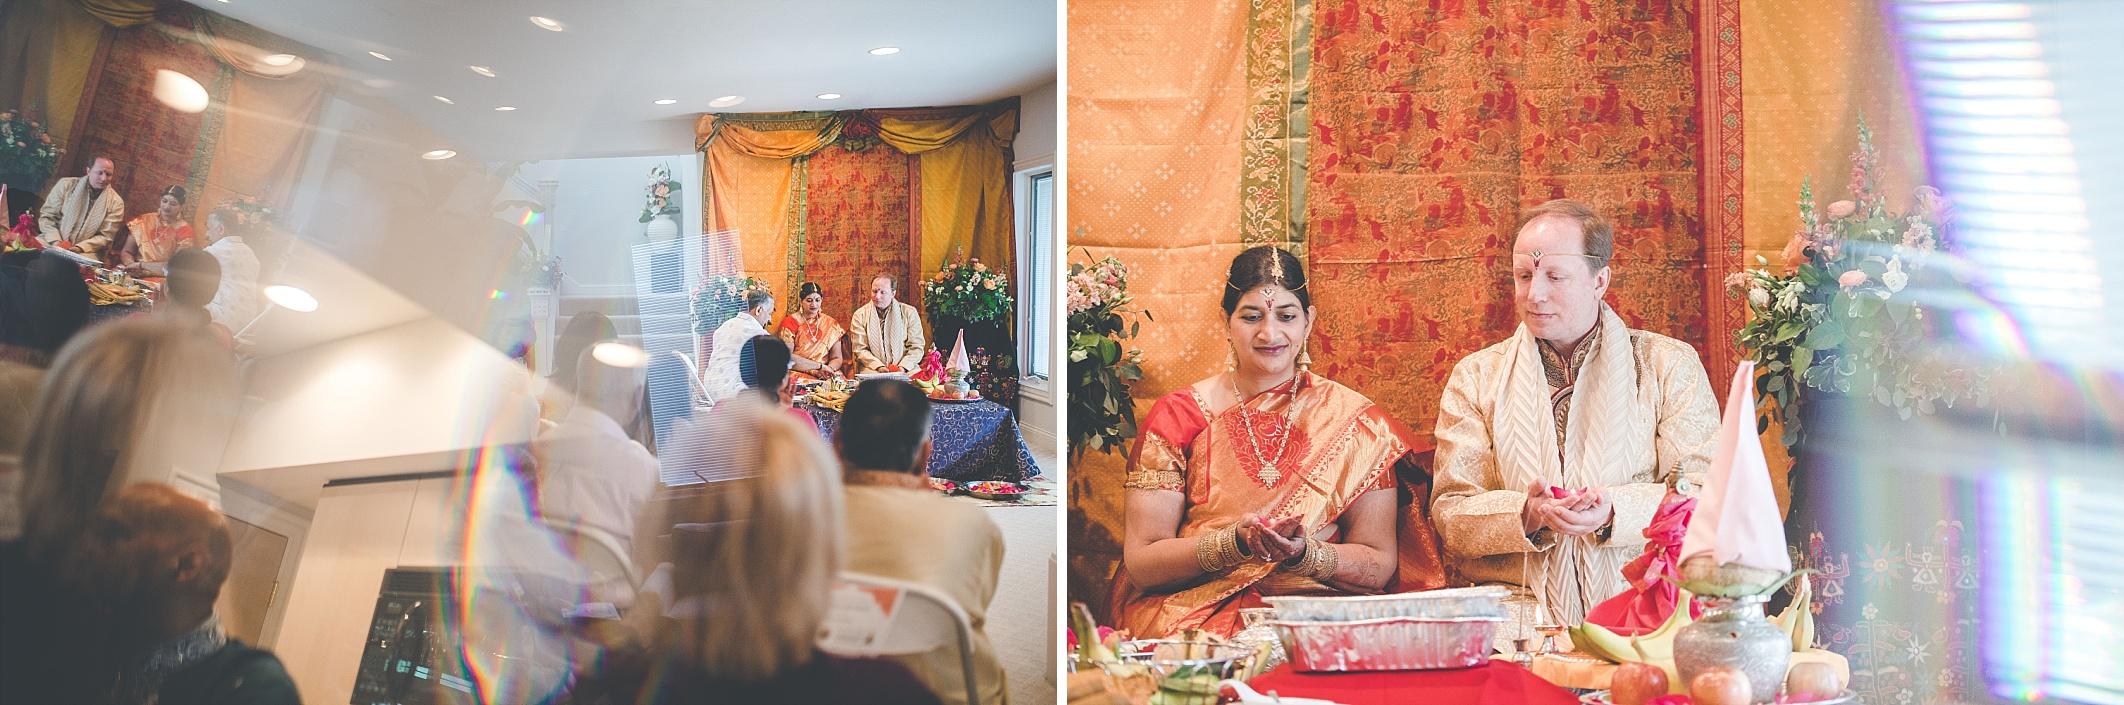 2683_dayton-indian-wedding-photographer-beavercreek_0038.jpg